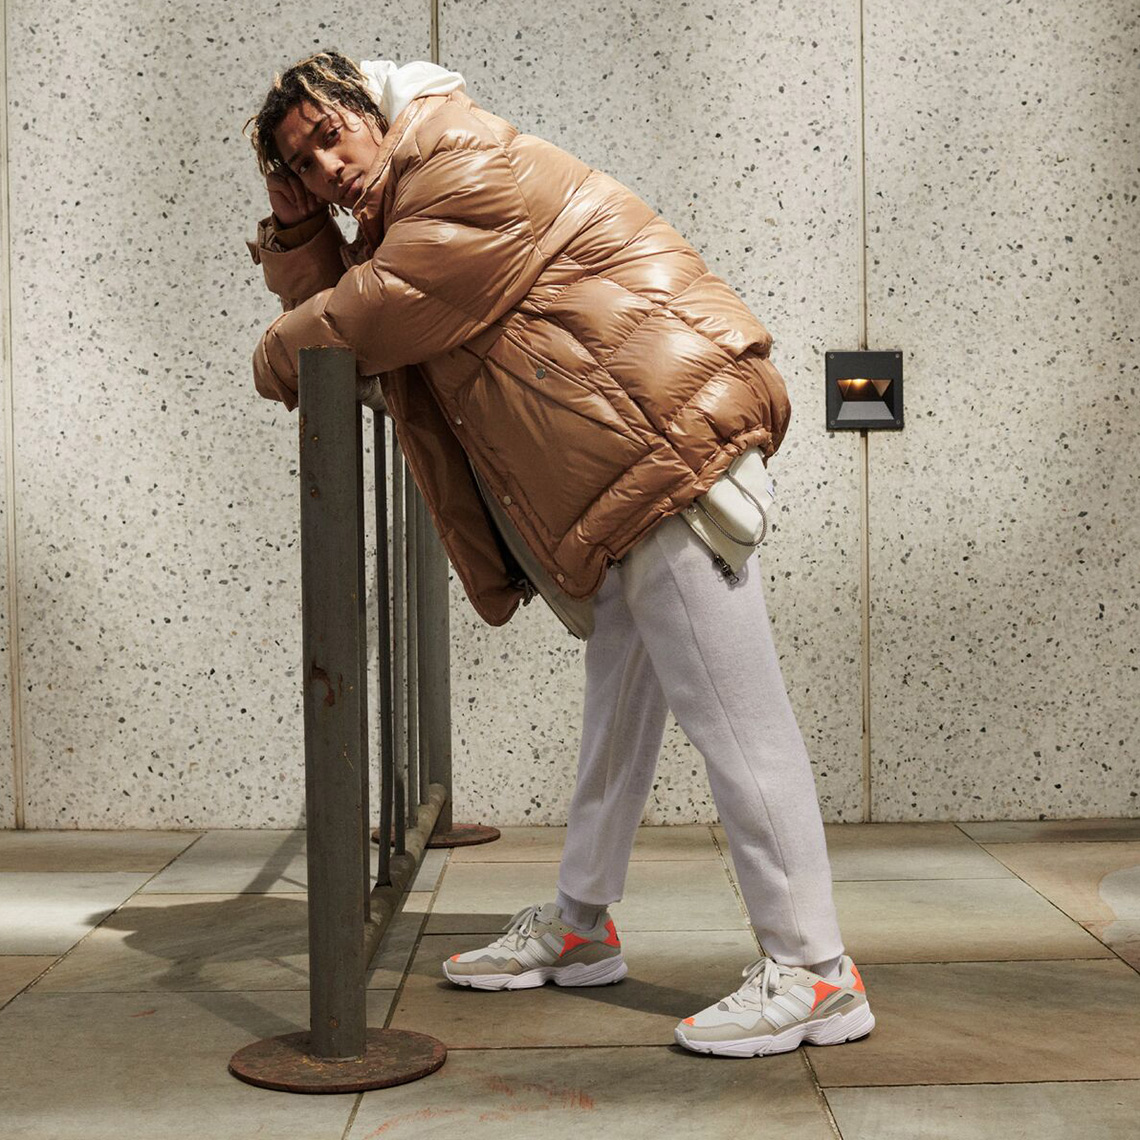 adidas yung 96 3 - adidas Yung 96 Photos + Release Info